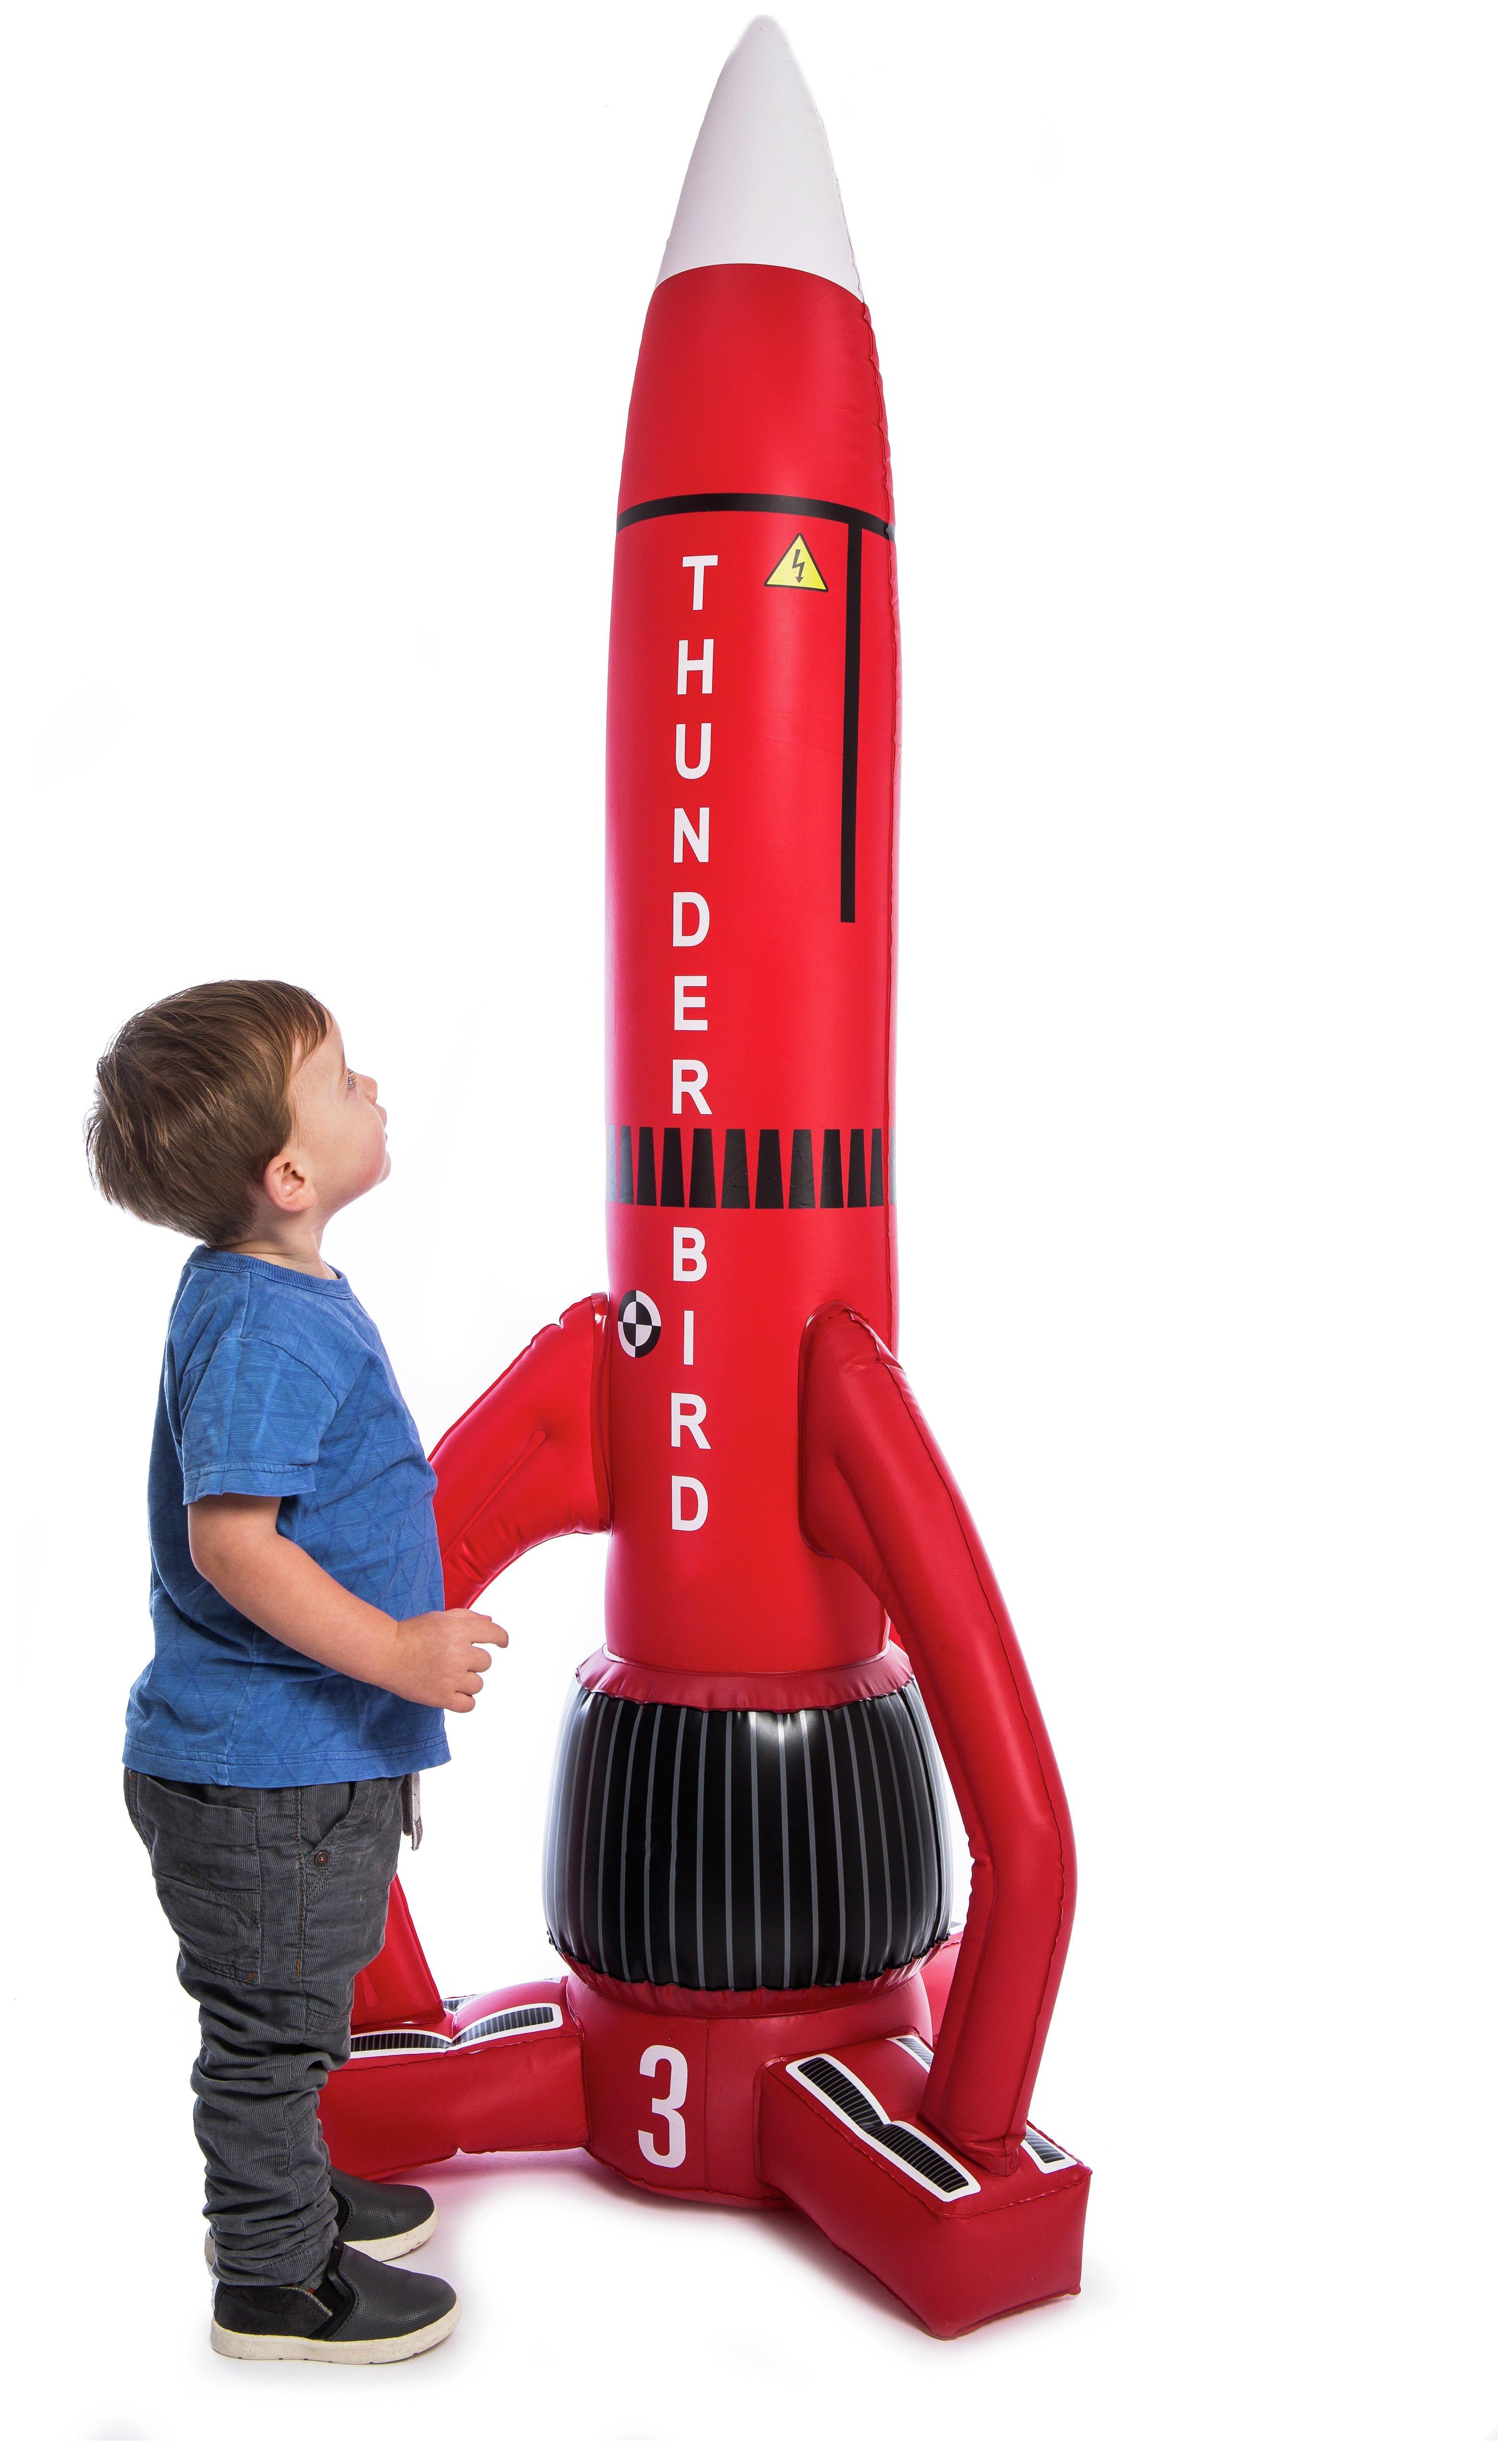 Thunderbirds - 3 Light Up Inflatable Rocket